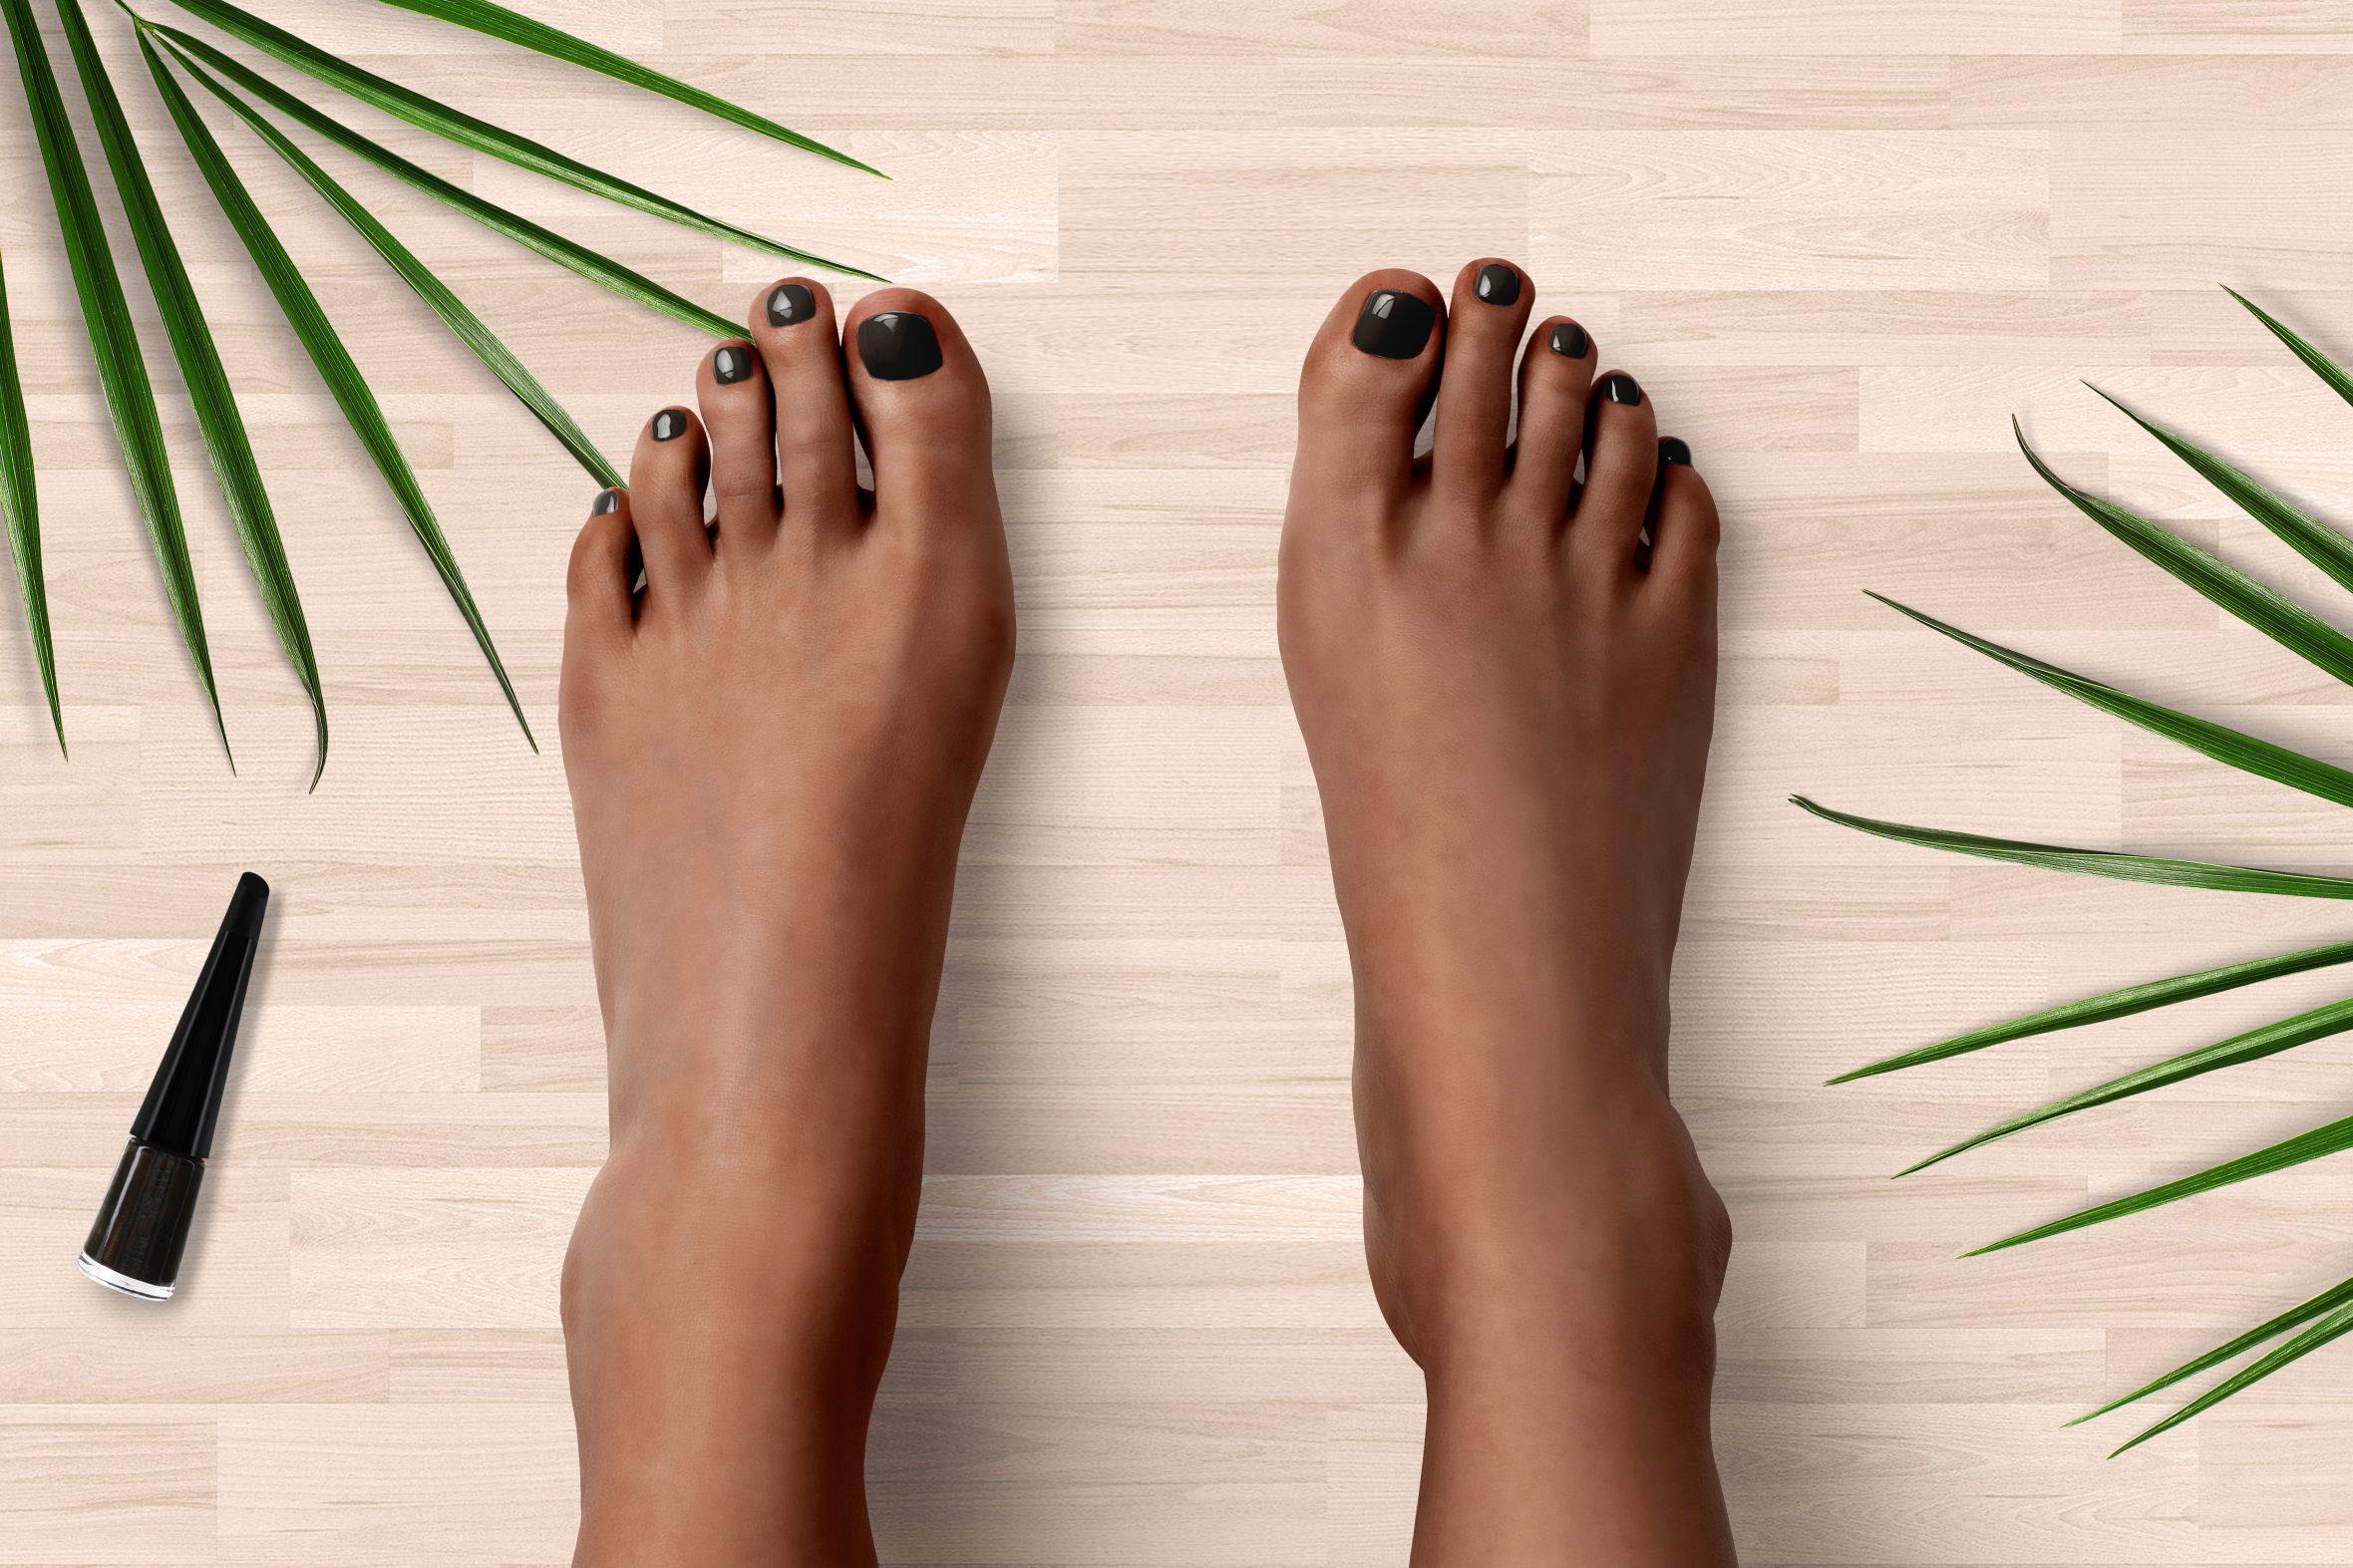 Bruine nagellak van Herôme voor mooie nagels